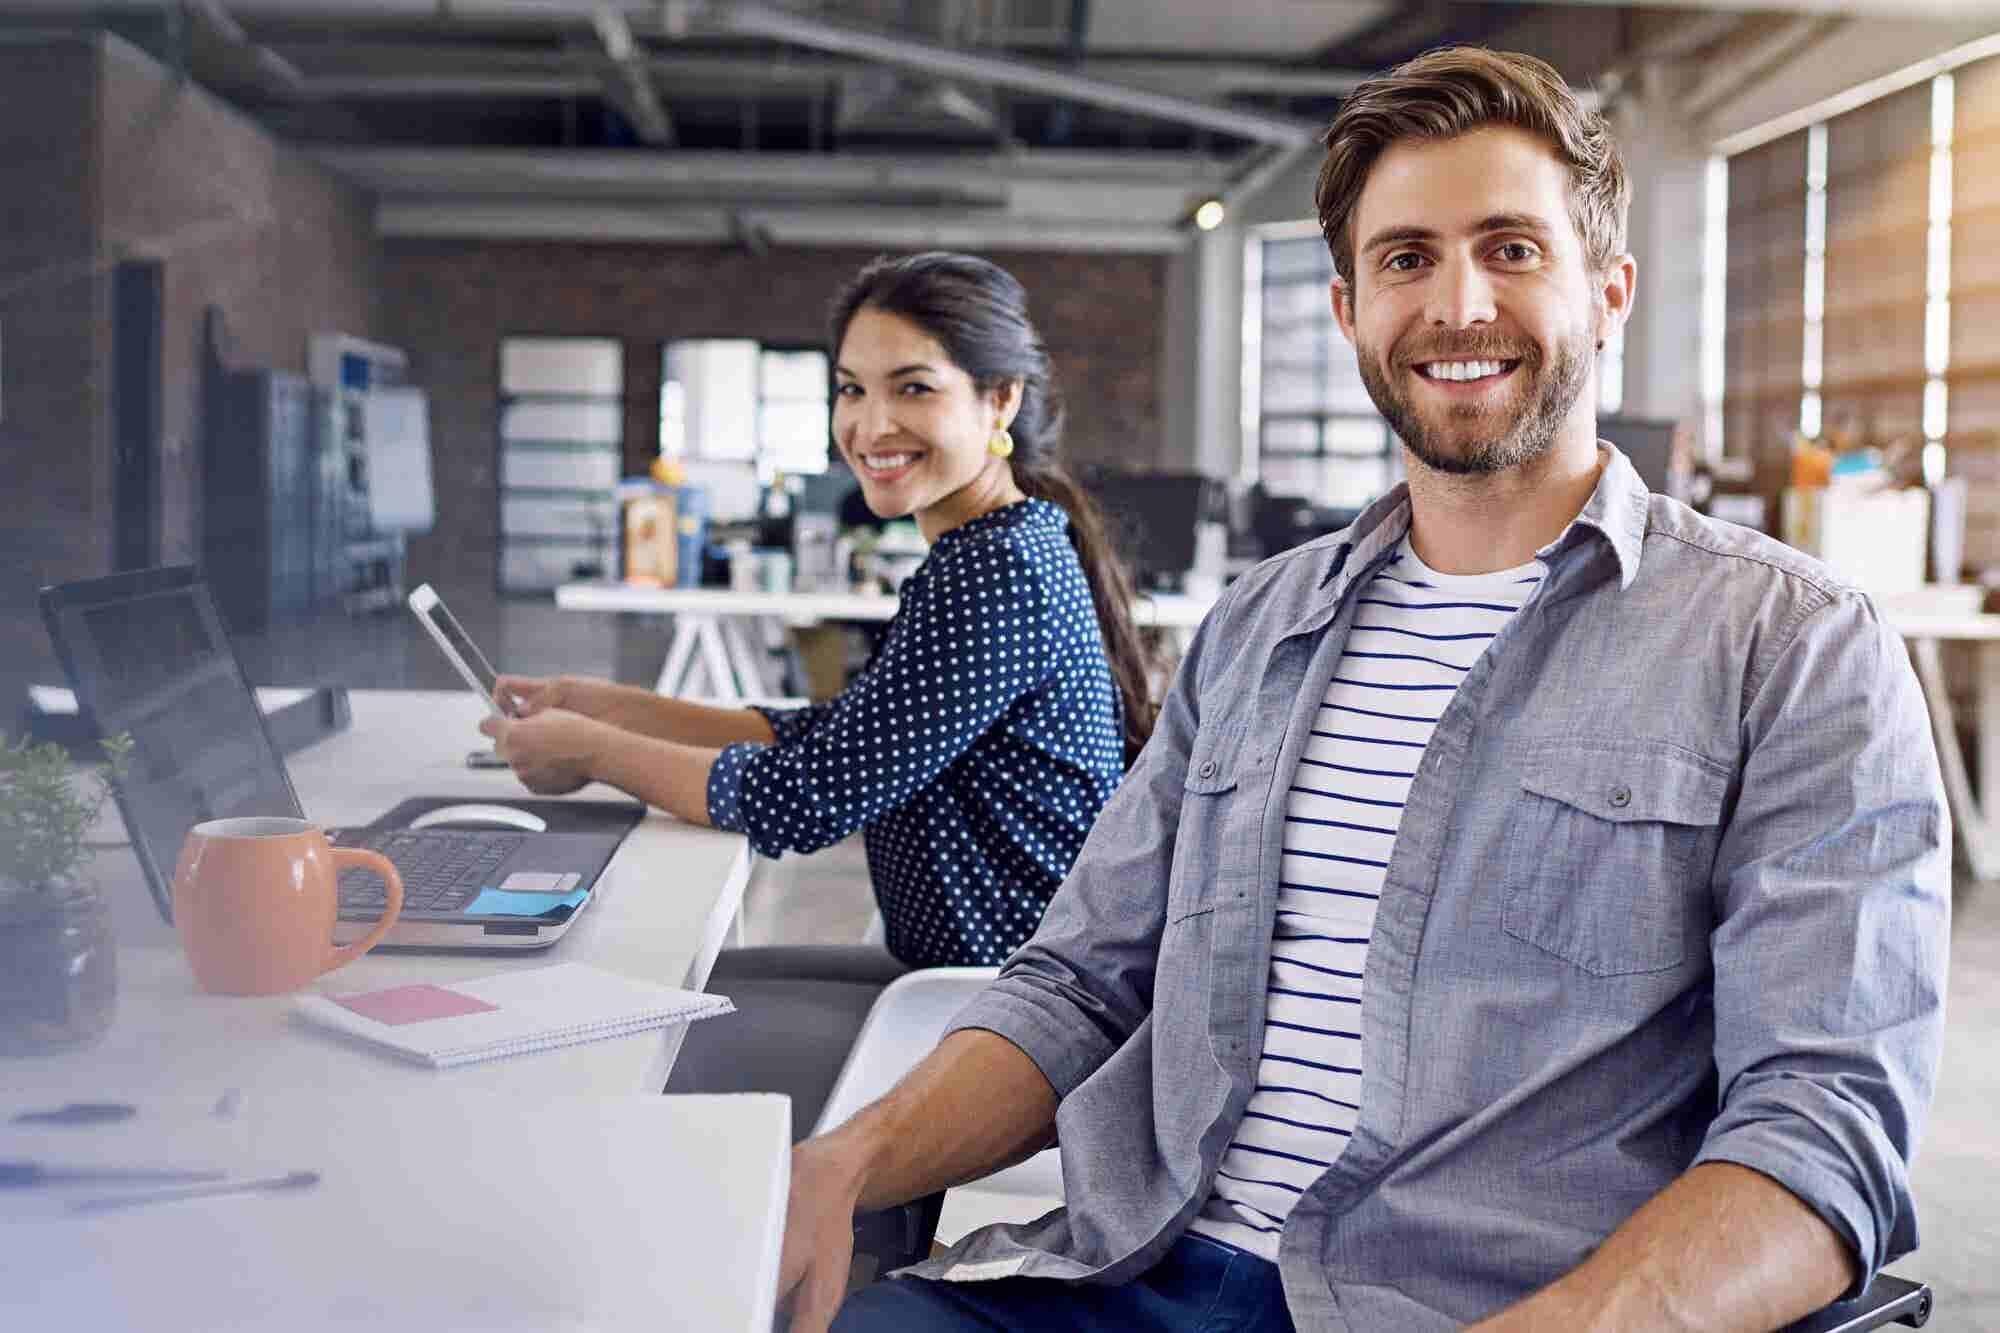 10 Online Under $11 Courses to Make You a Faster, Smarter Entrepreneur